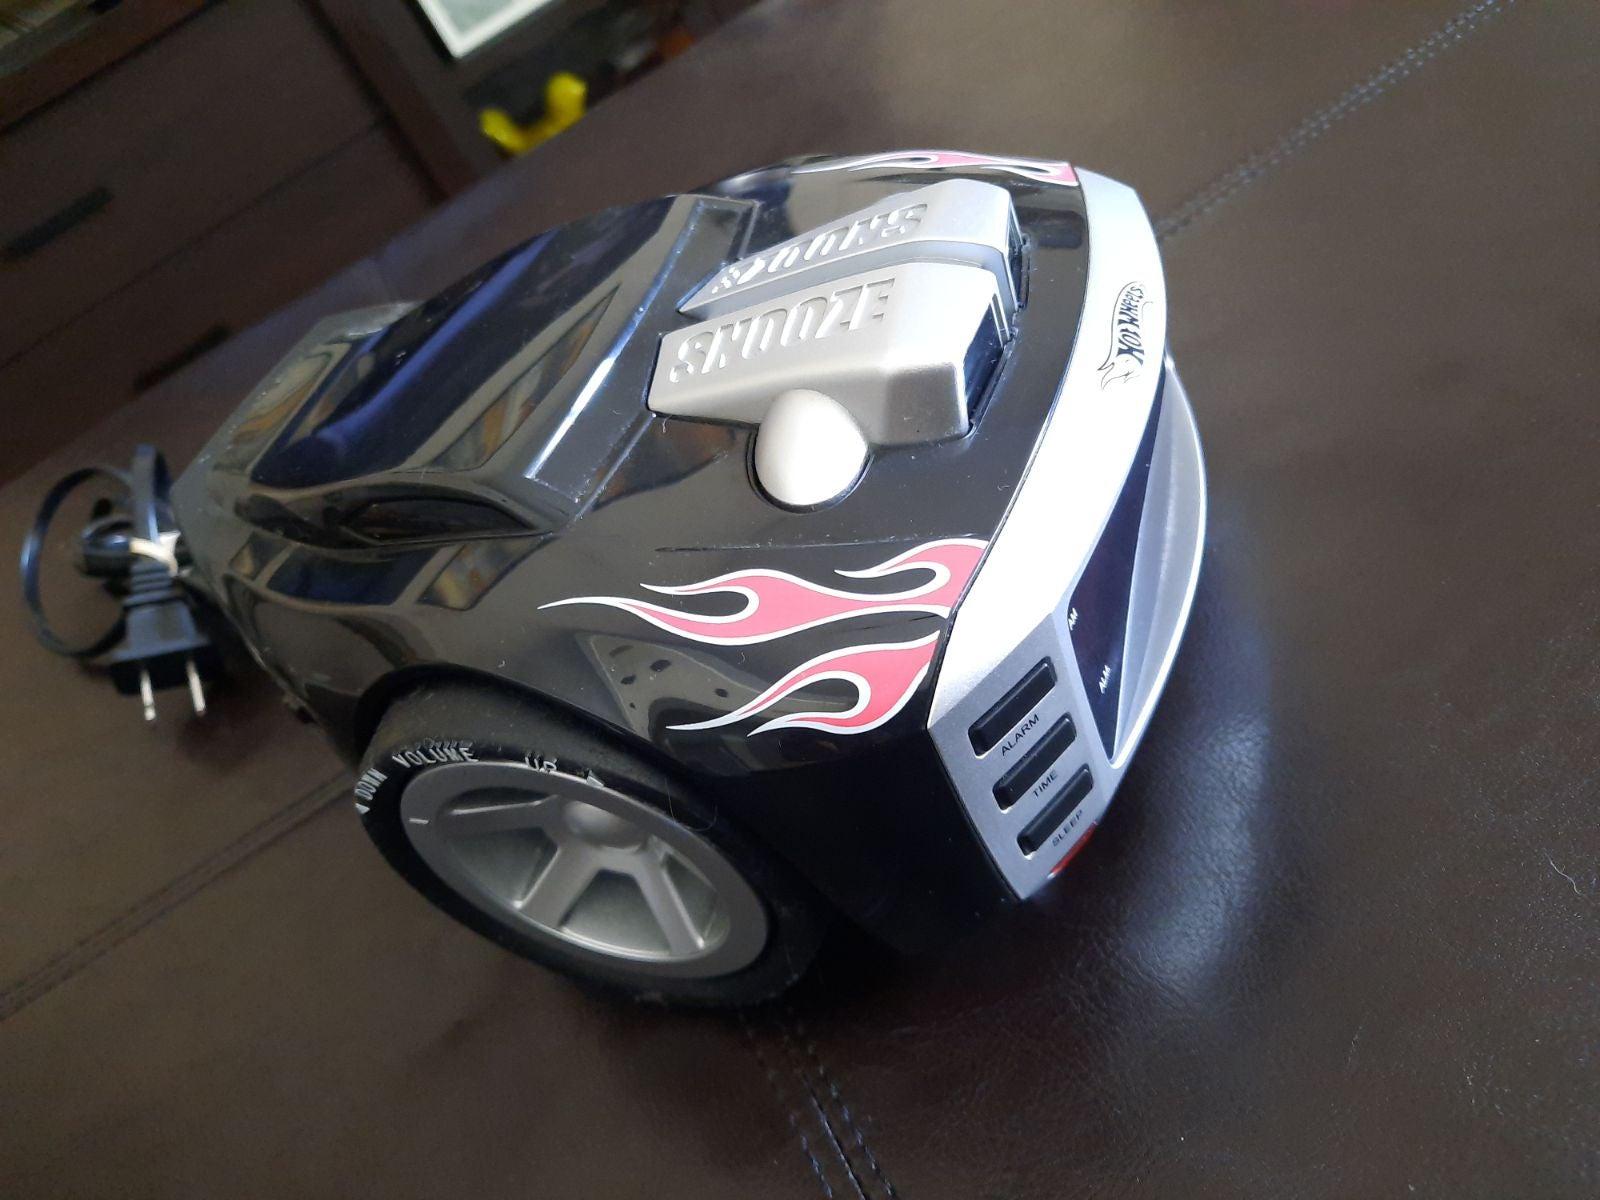 Hot Wheels SnoreSlammer AM/FM Alarm Cloc